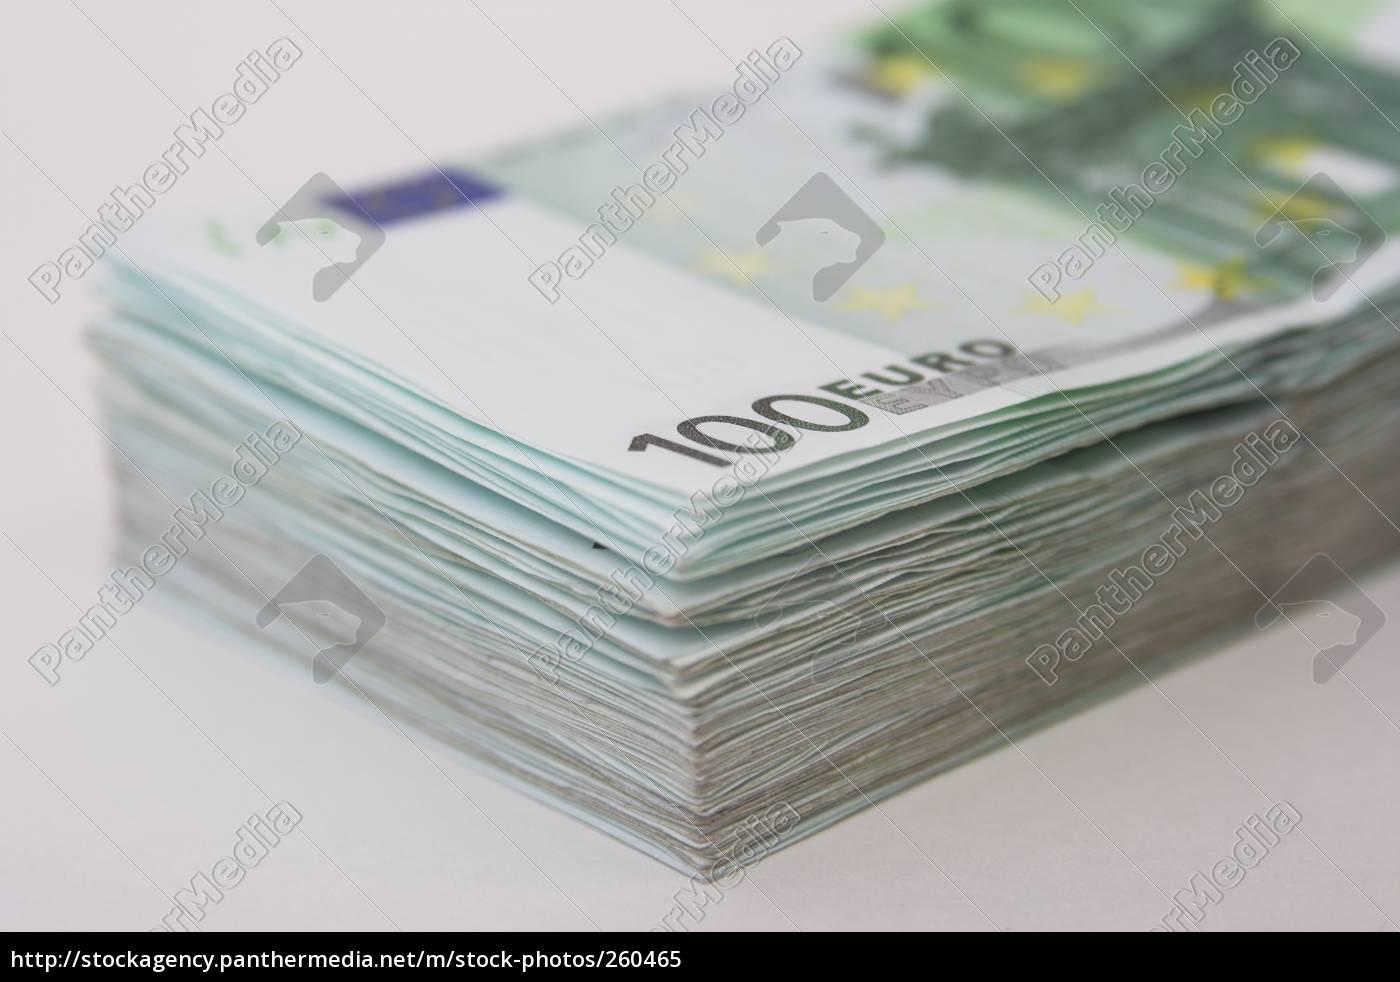 banknotes, open, 100, (10, 000, €), ver.5 - 260465